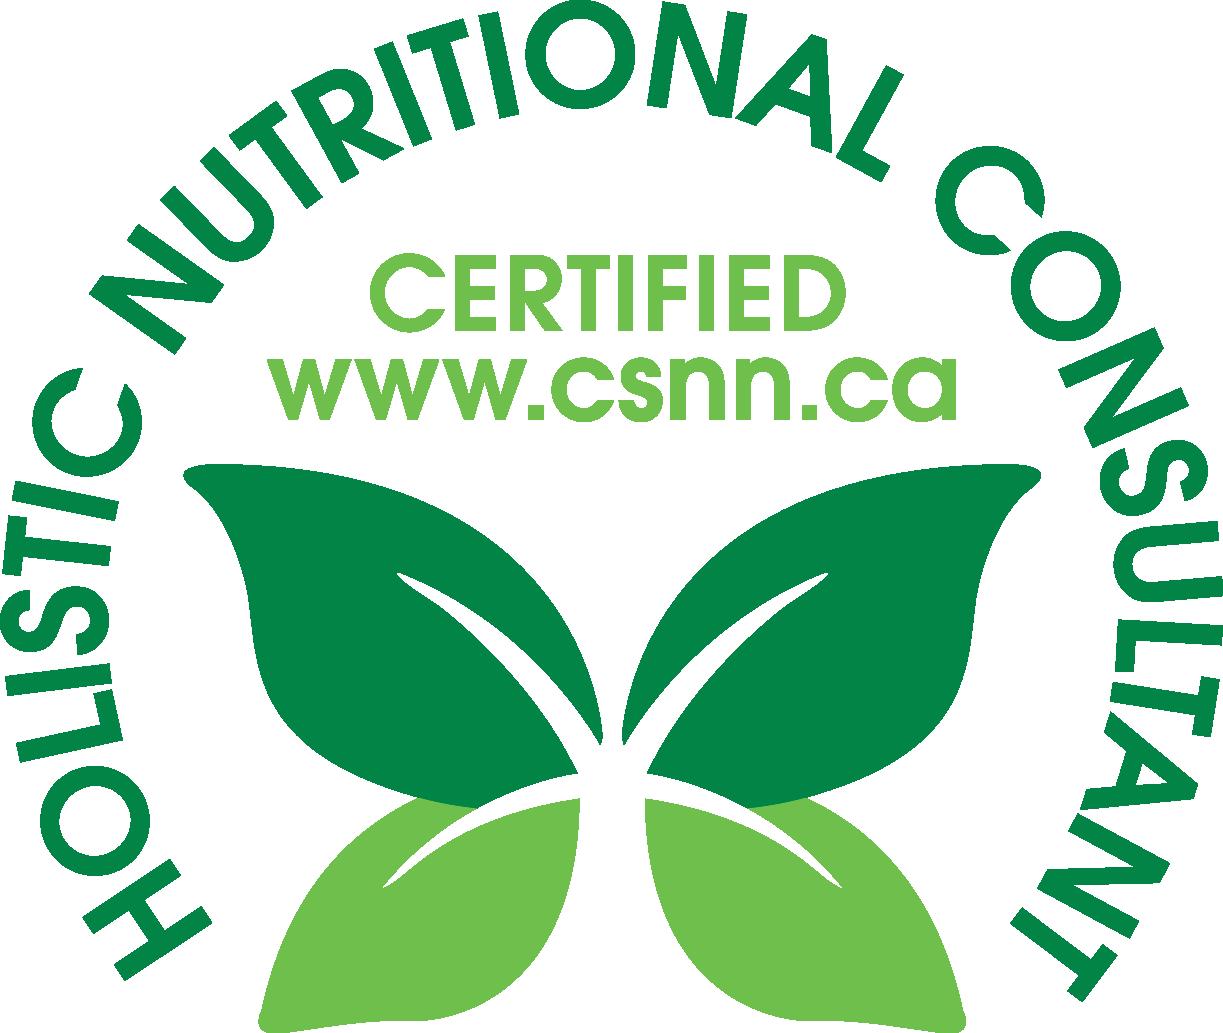 CSNN-Certification-Mark-lg.png